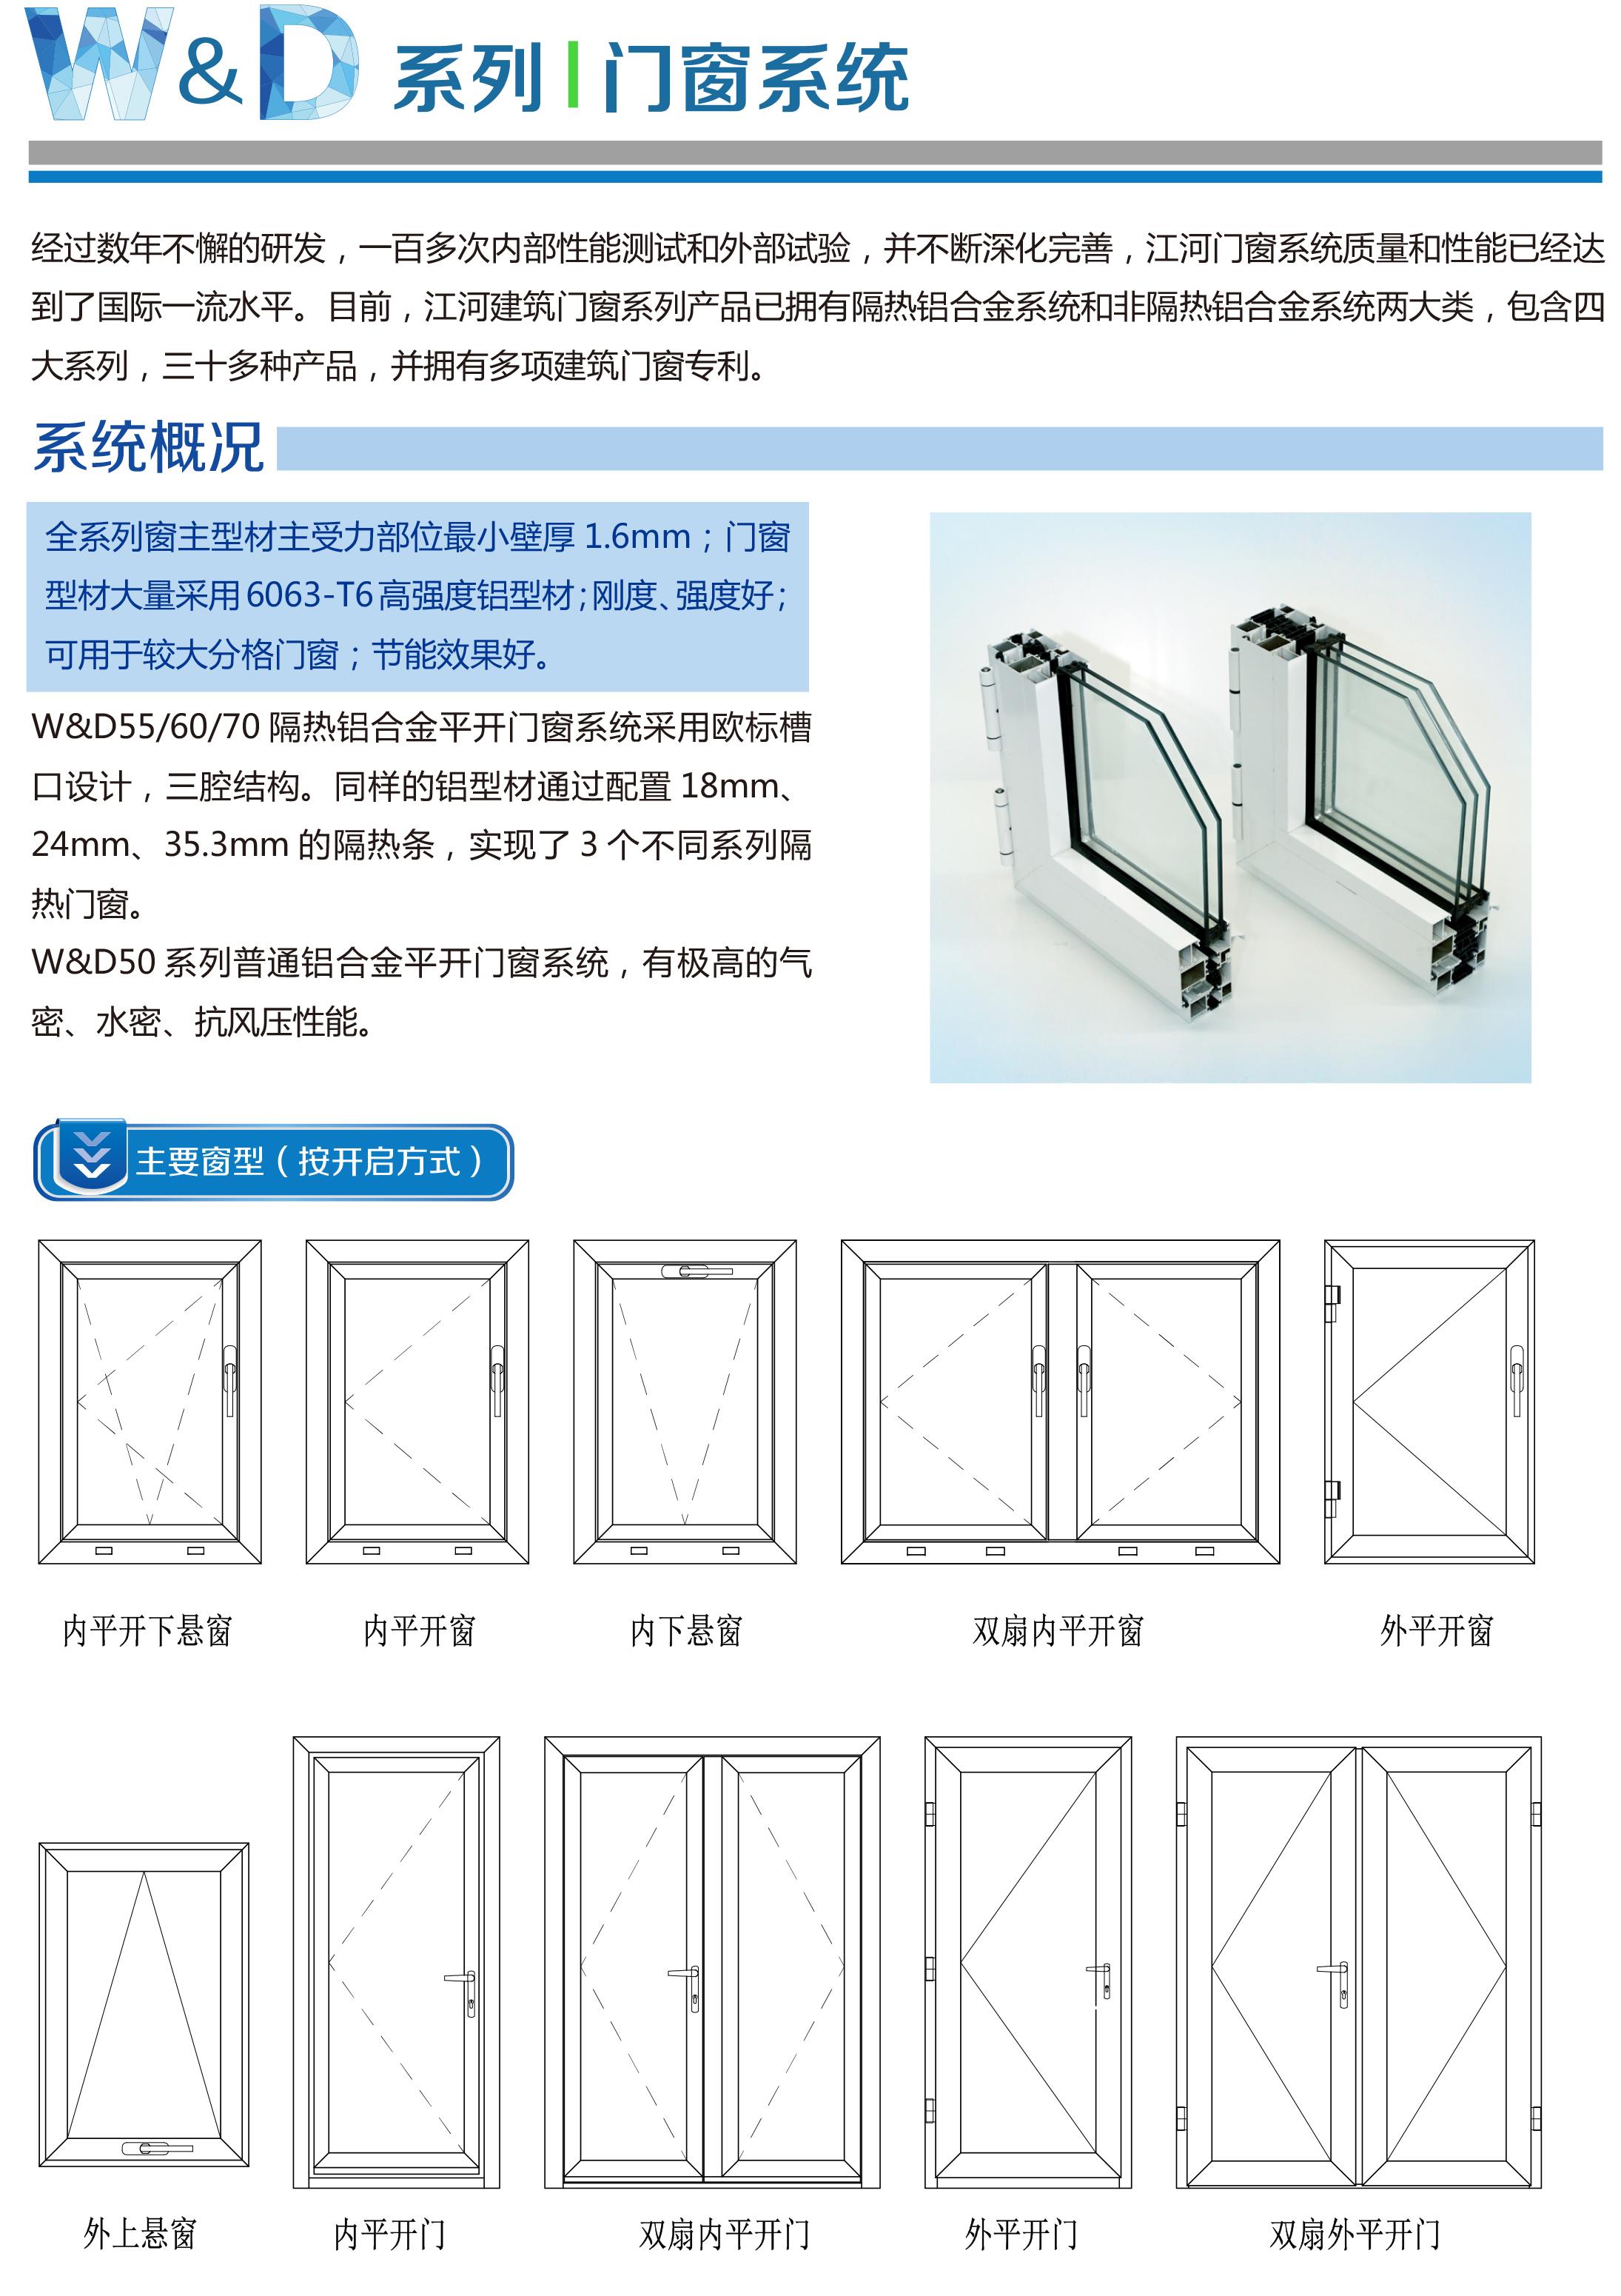 W&D系列-门窗系统